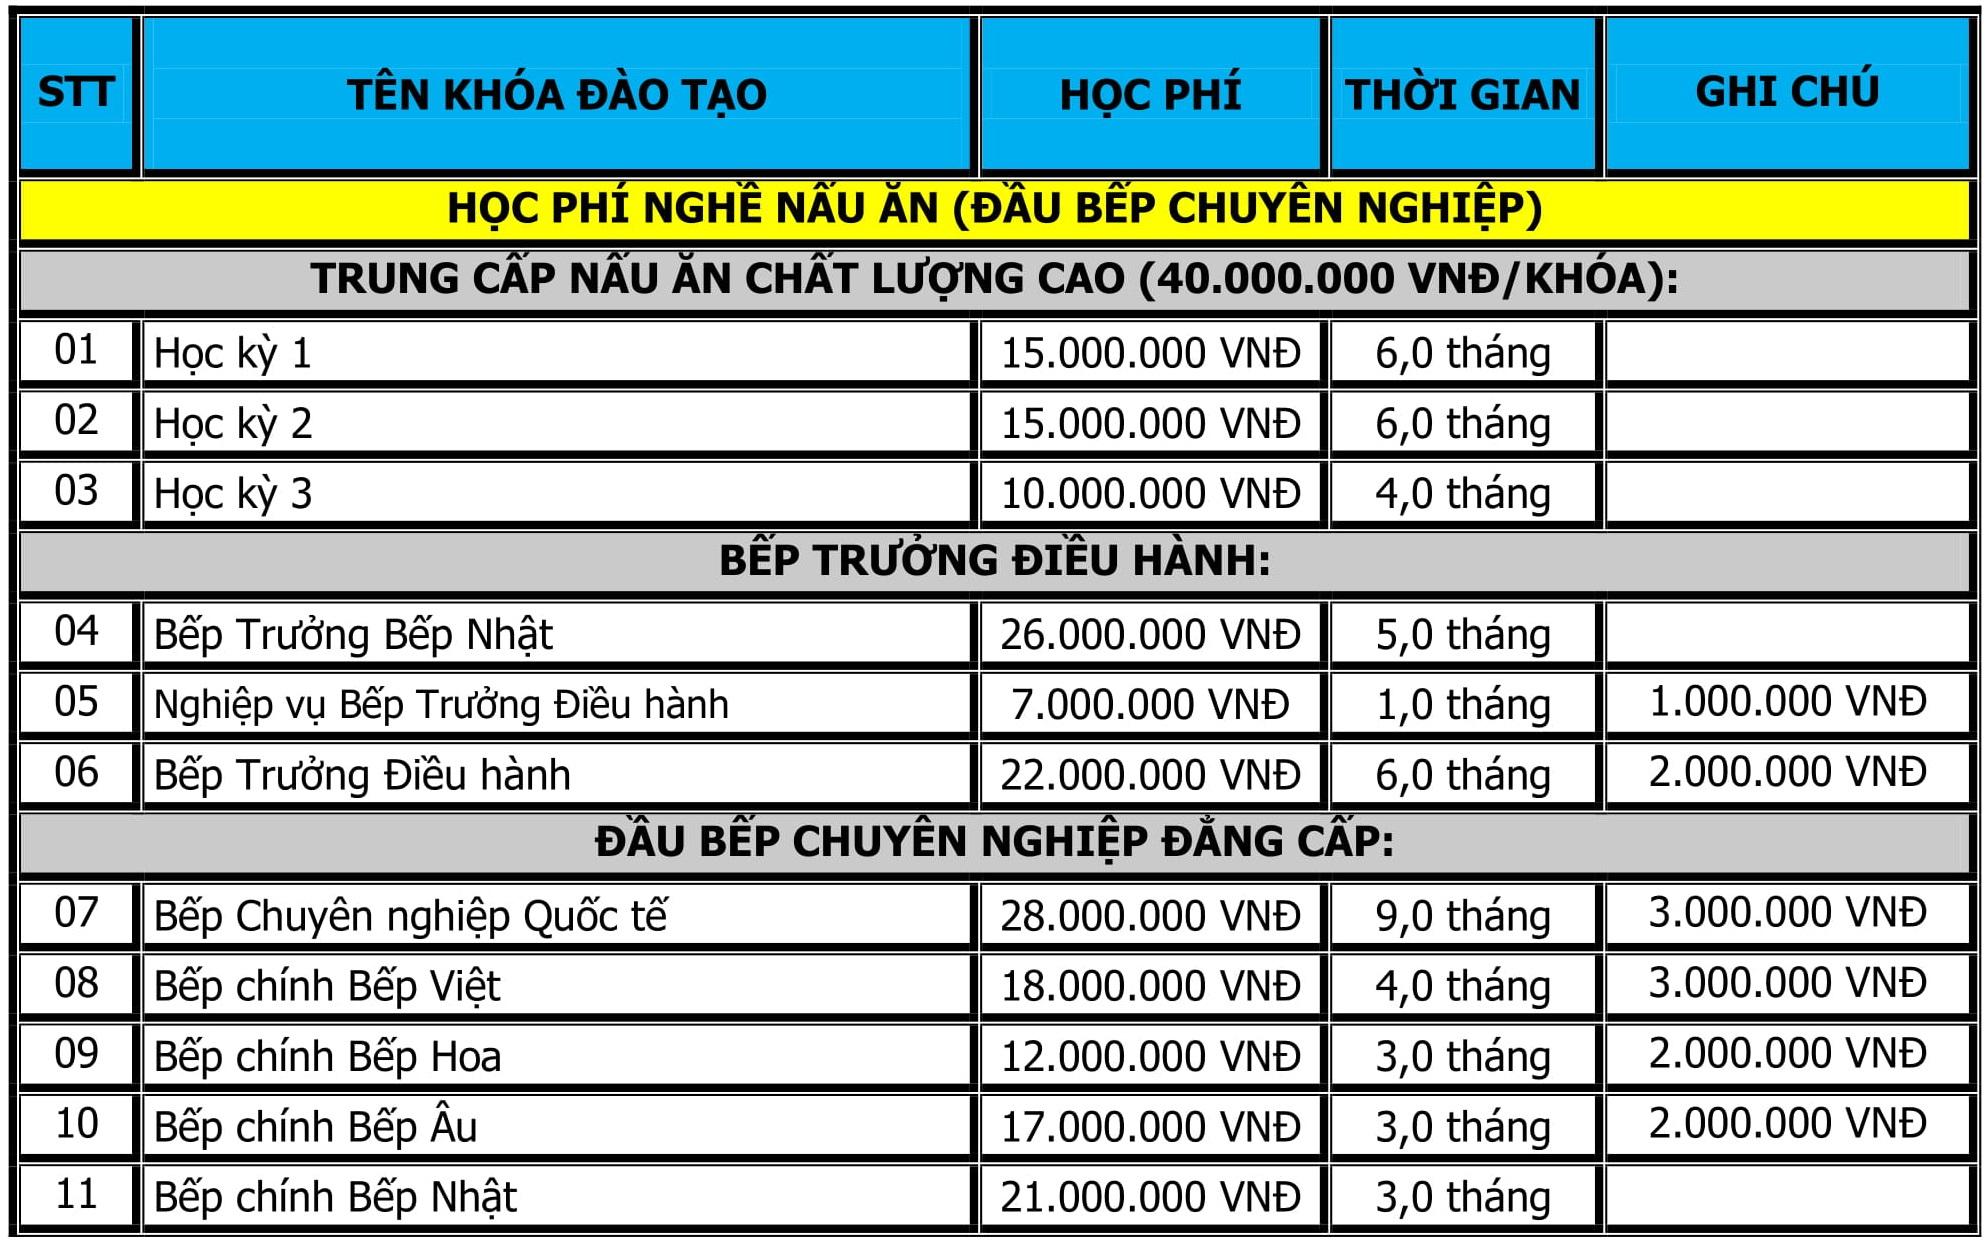 HOC PHI CAC KHOA DAO TAO-1